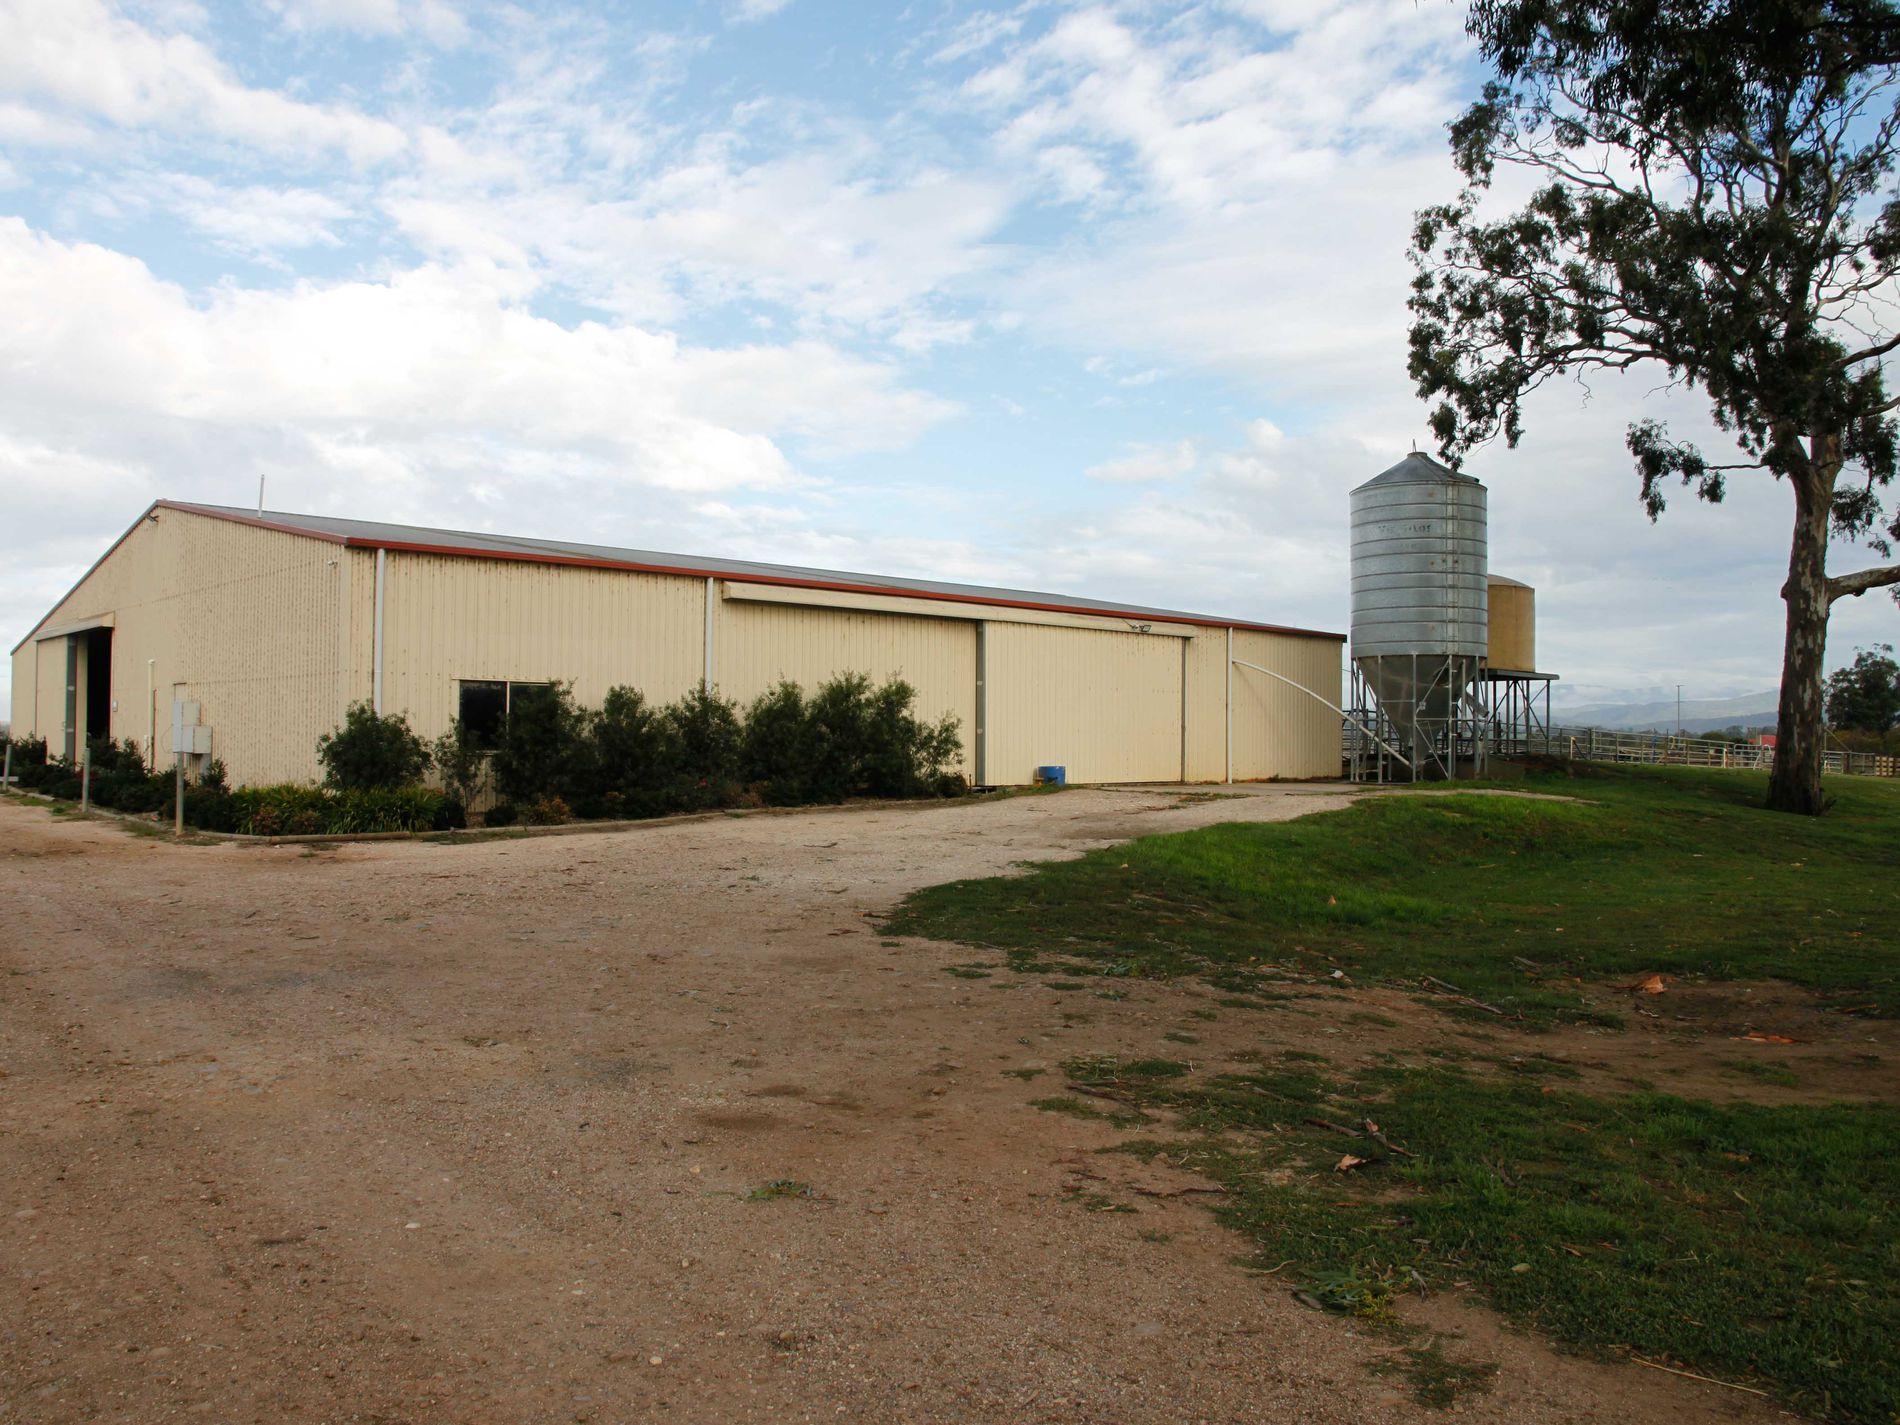 271 Bushy Park-Valencia Creek Road, Maffra